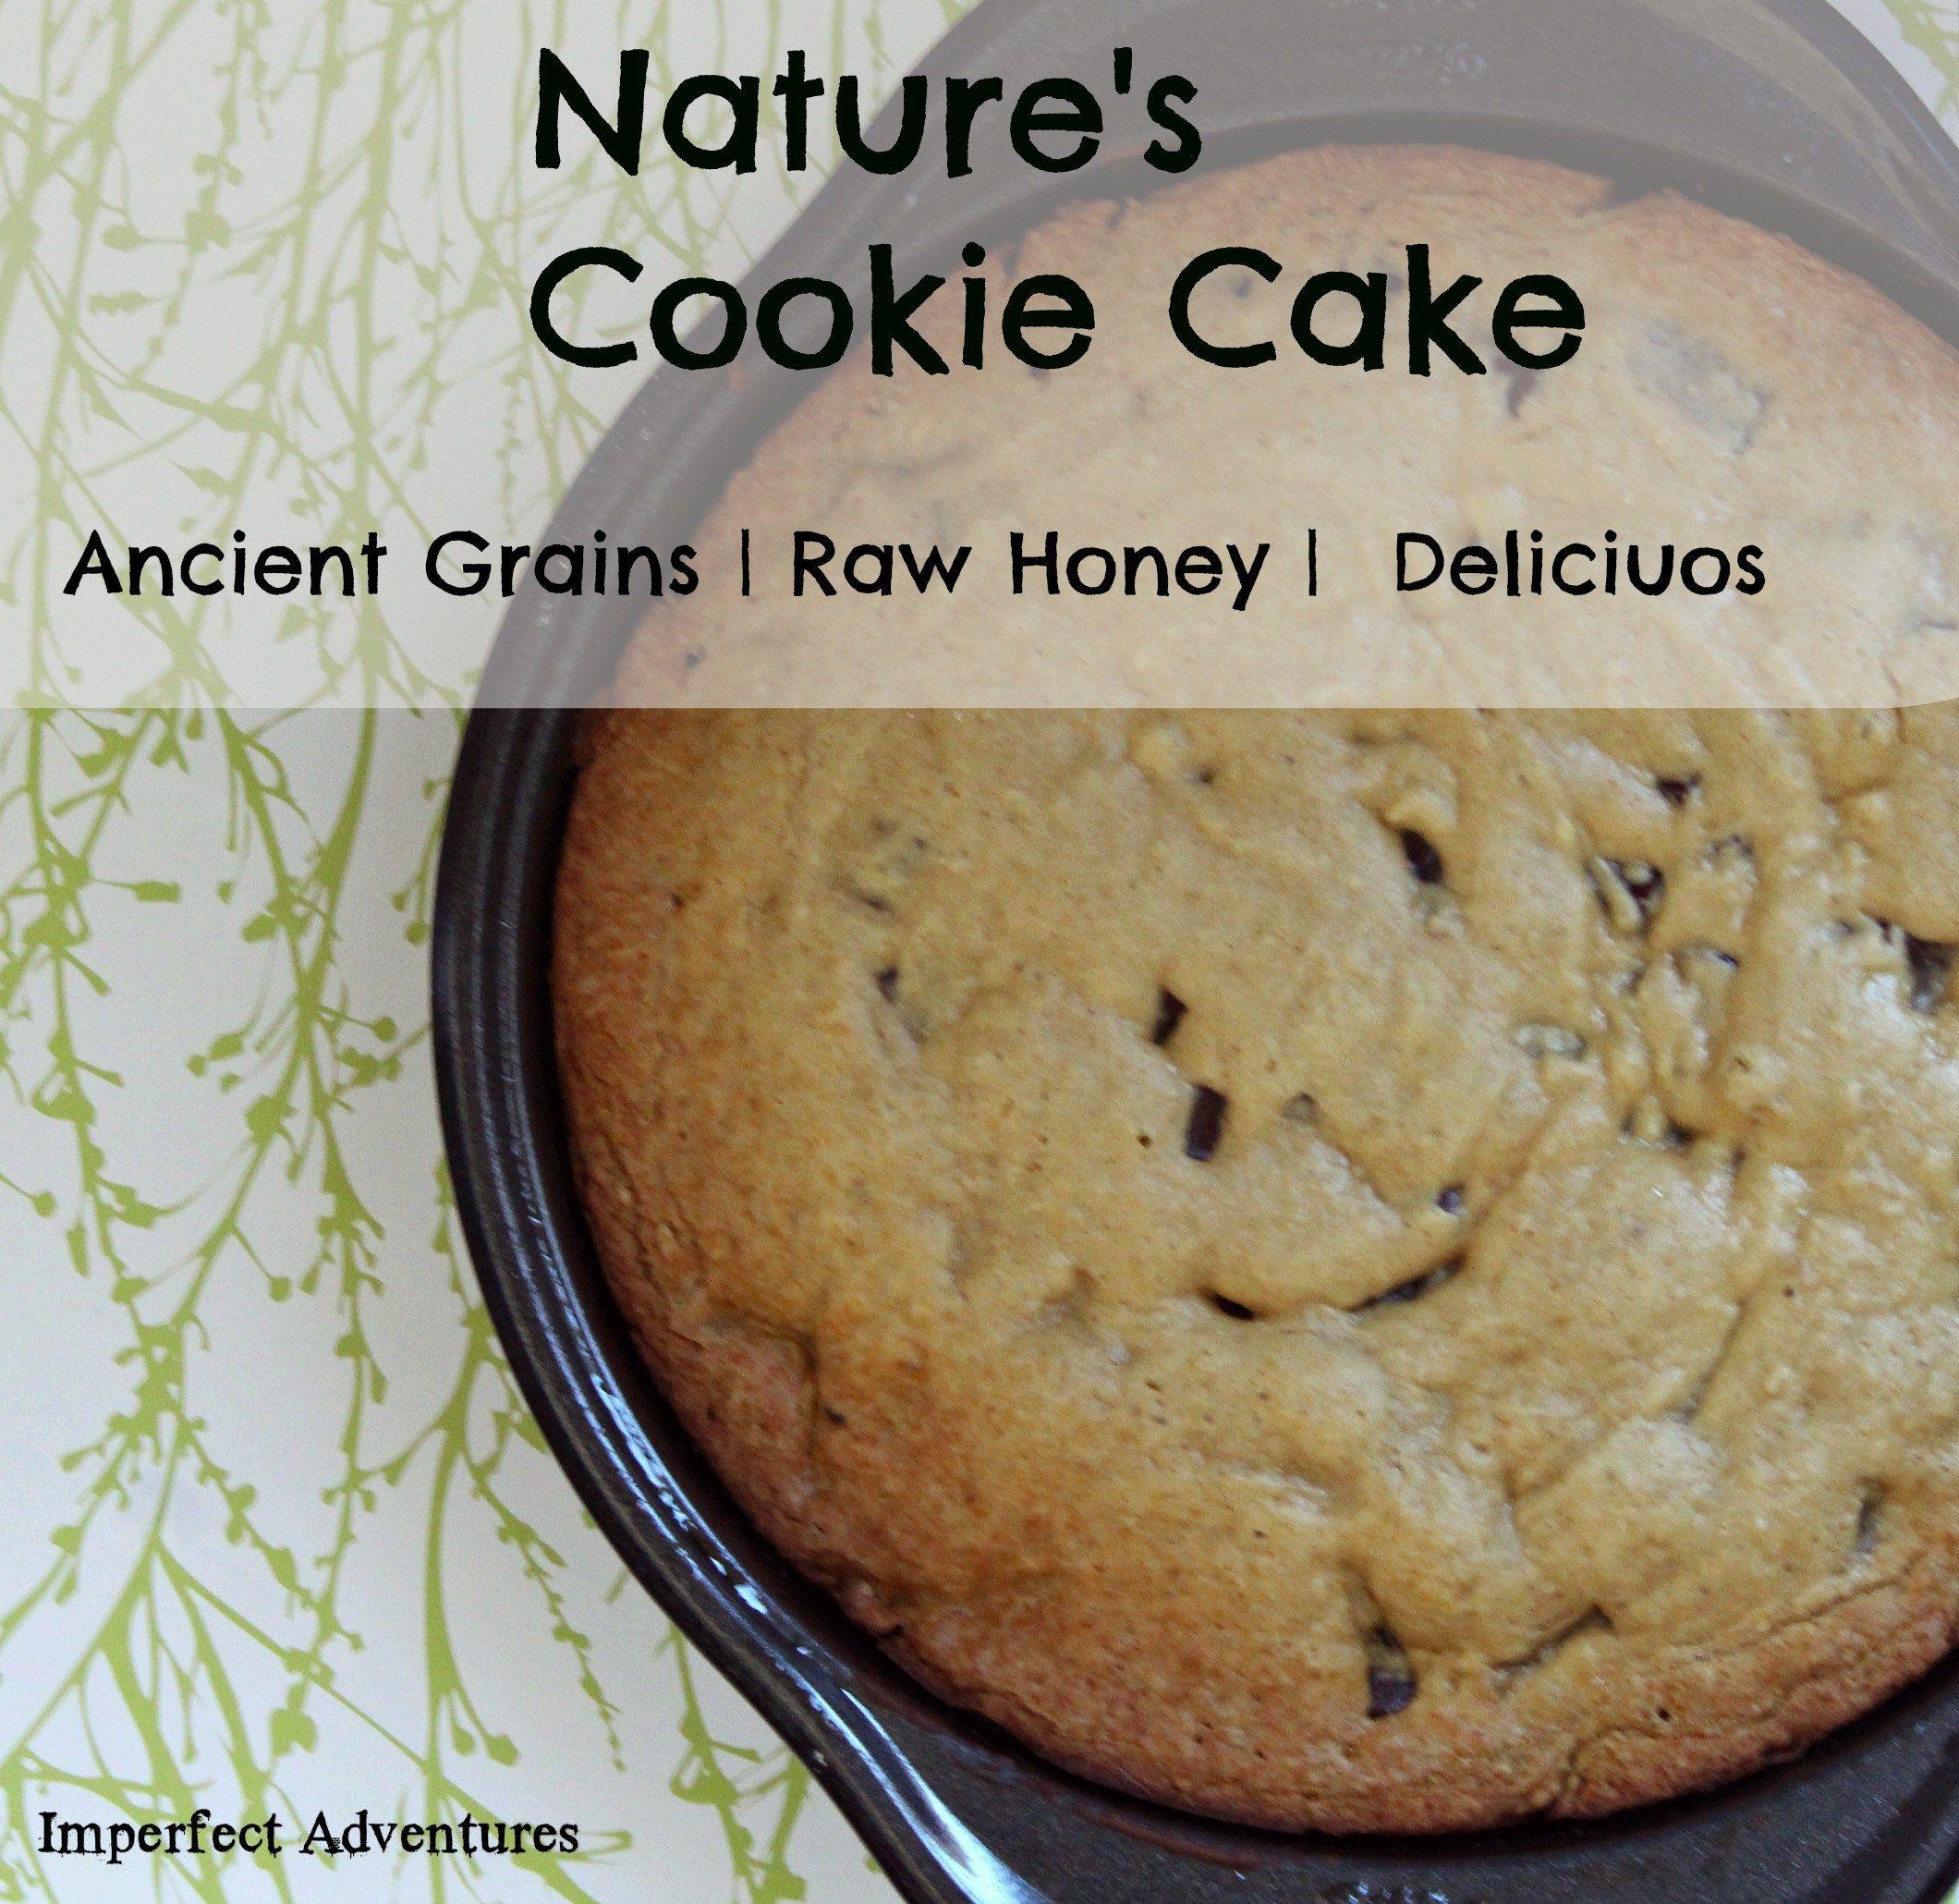 Nature's Cookie Cake